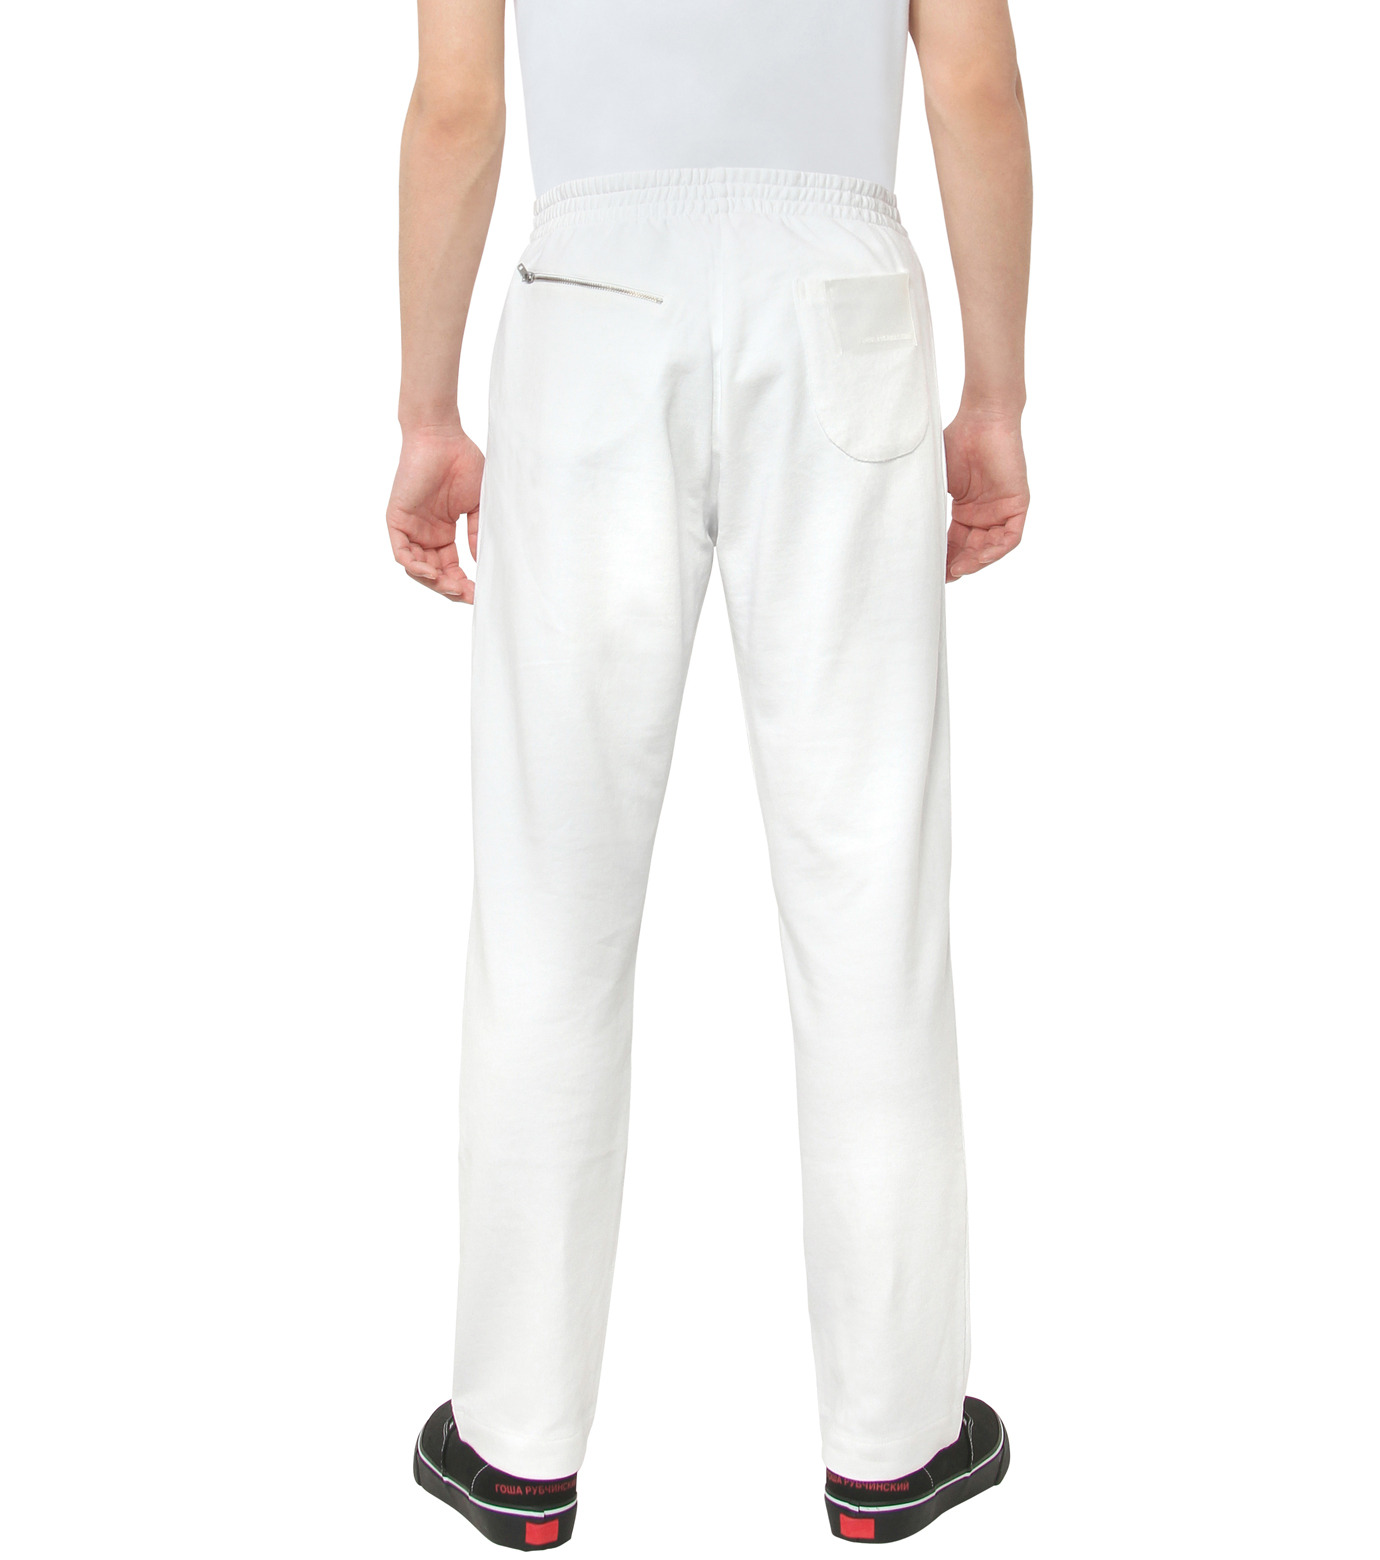 Gosha Rubchinskiy(ゴーシャ・ラブチンスキー)のCOTTON SWEATPANT ZIP DETAIL-WHITE(パンツ/pants)-G008P007-4 拡大詳細画像2